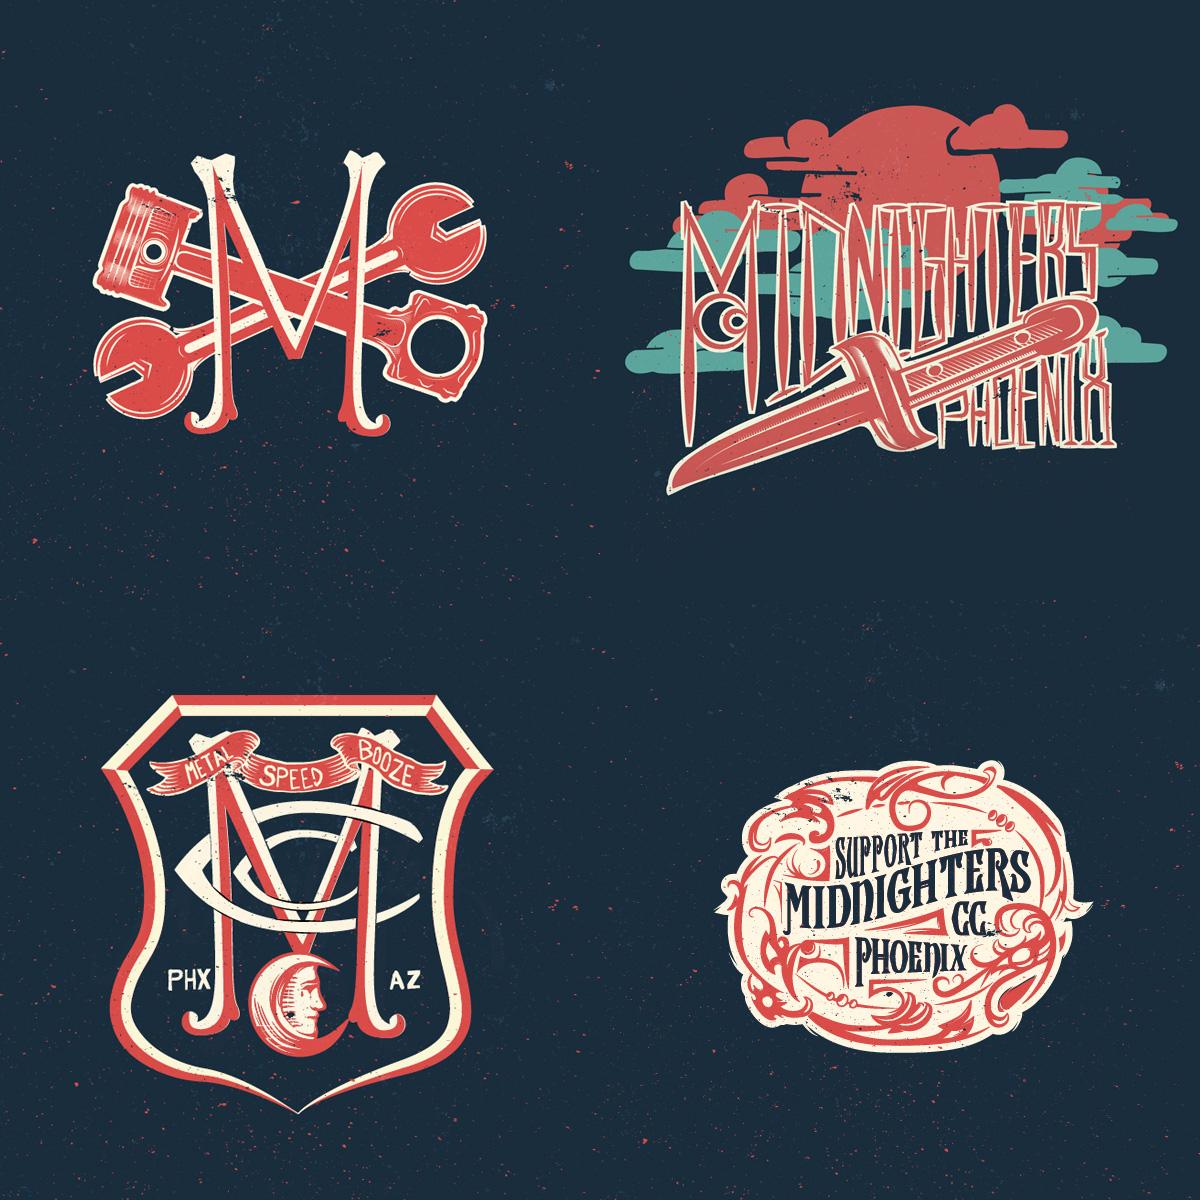 Midnighters3